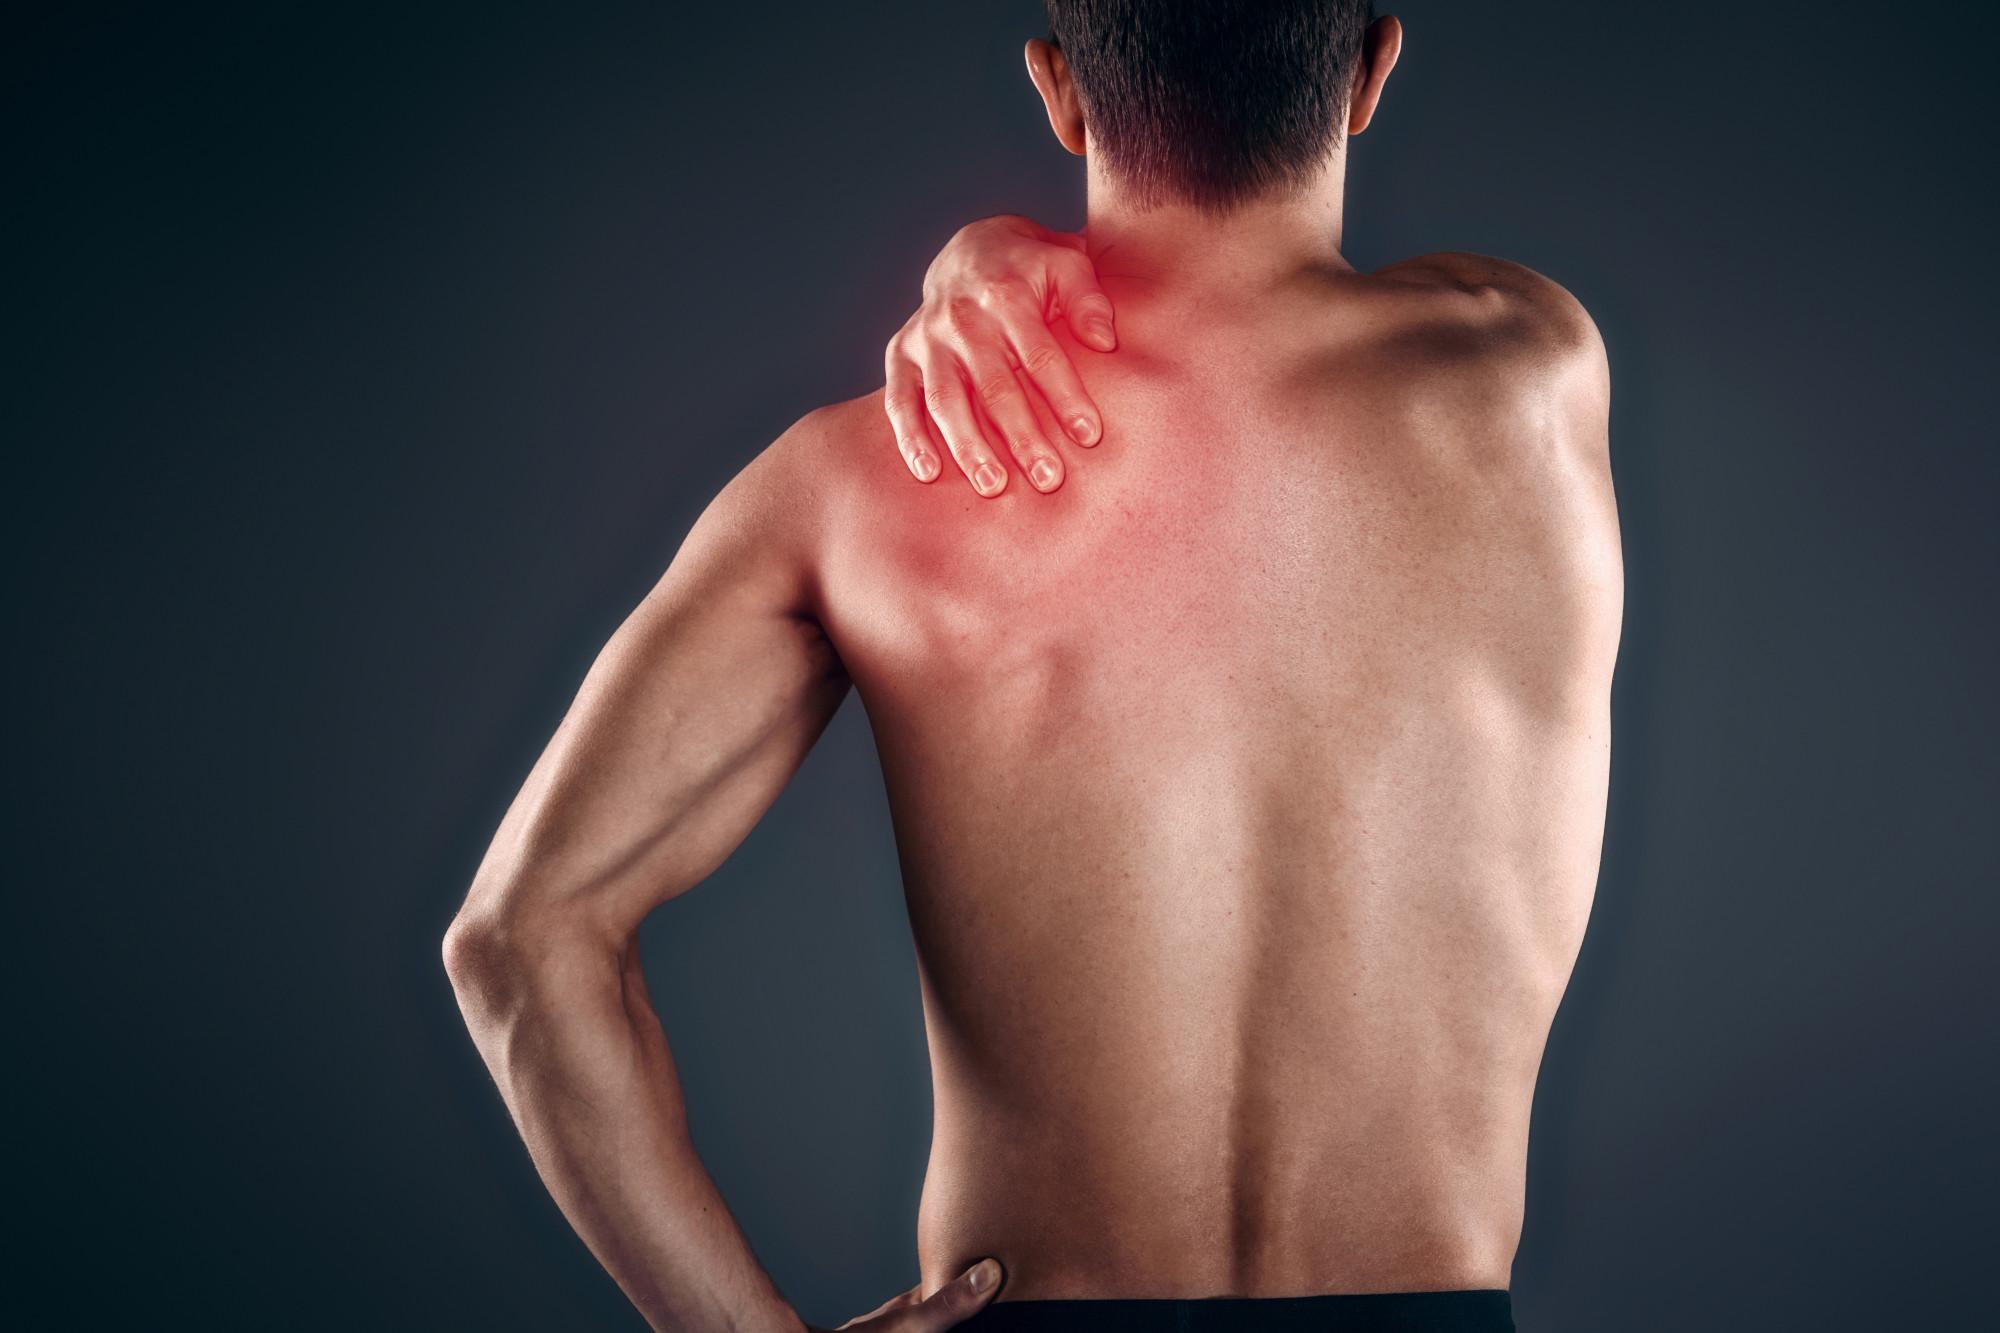 What Do Pain Management Doctors Do?